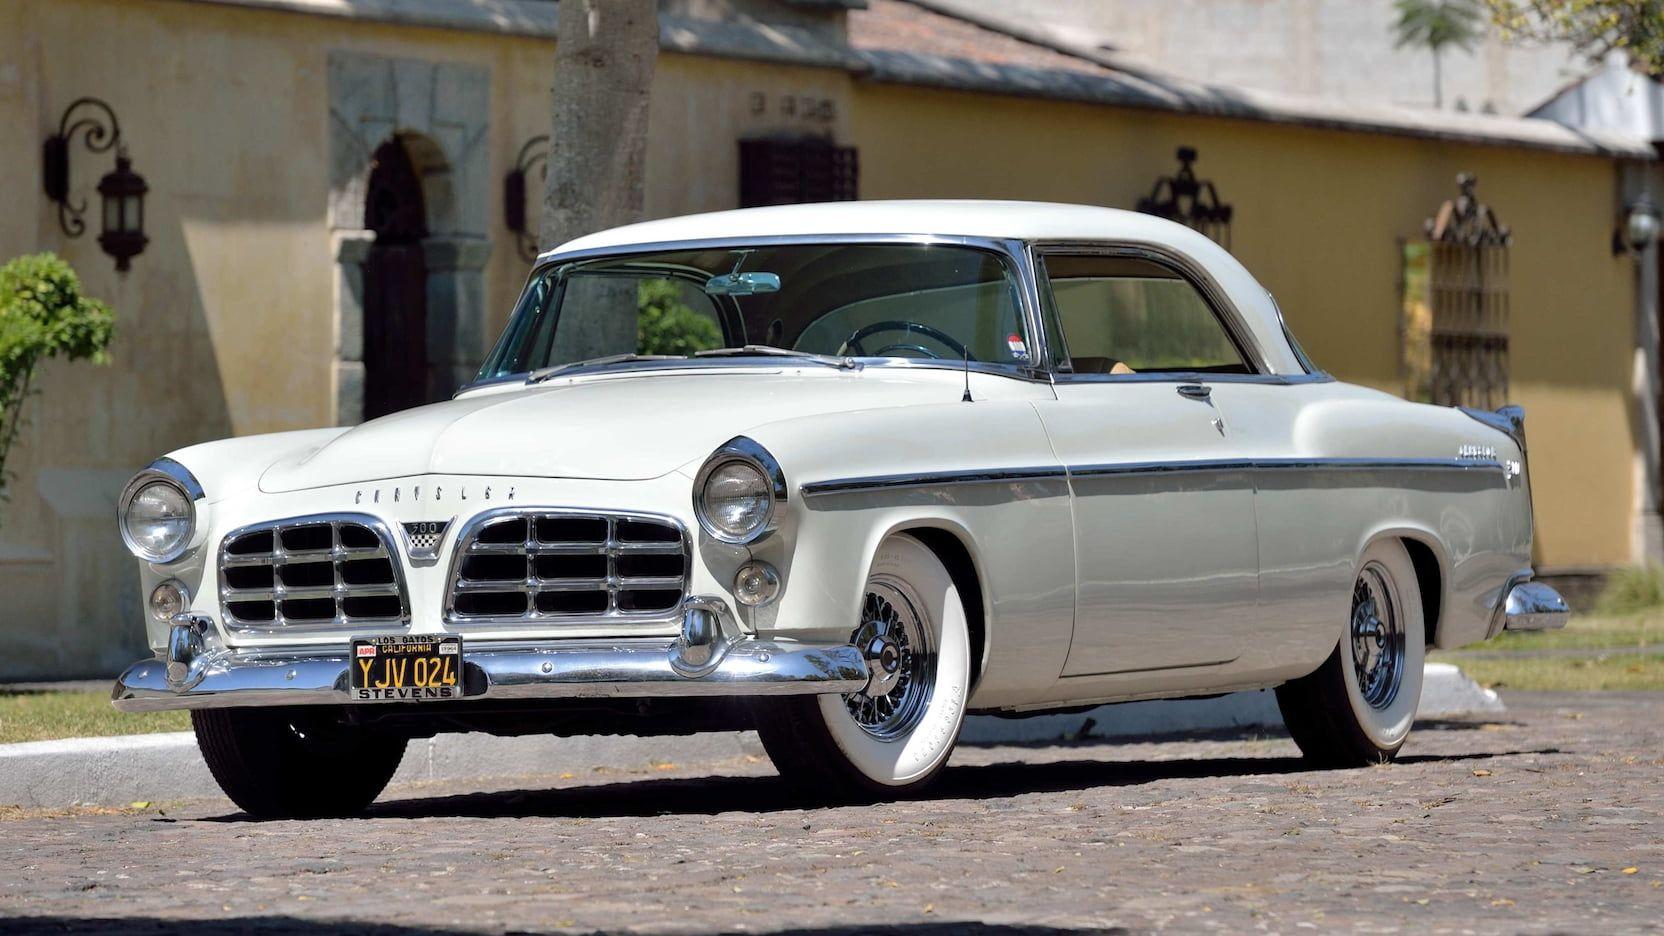 1955 Chrysler C300 presented as Lot S71 at Houston, TX